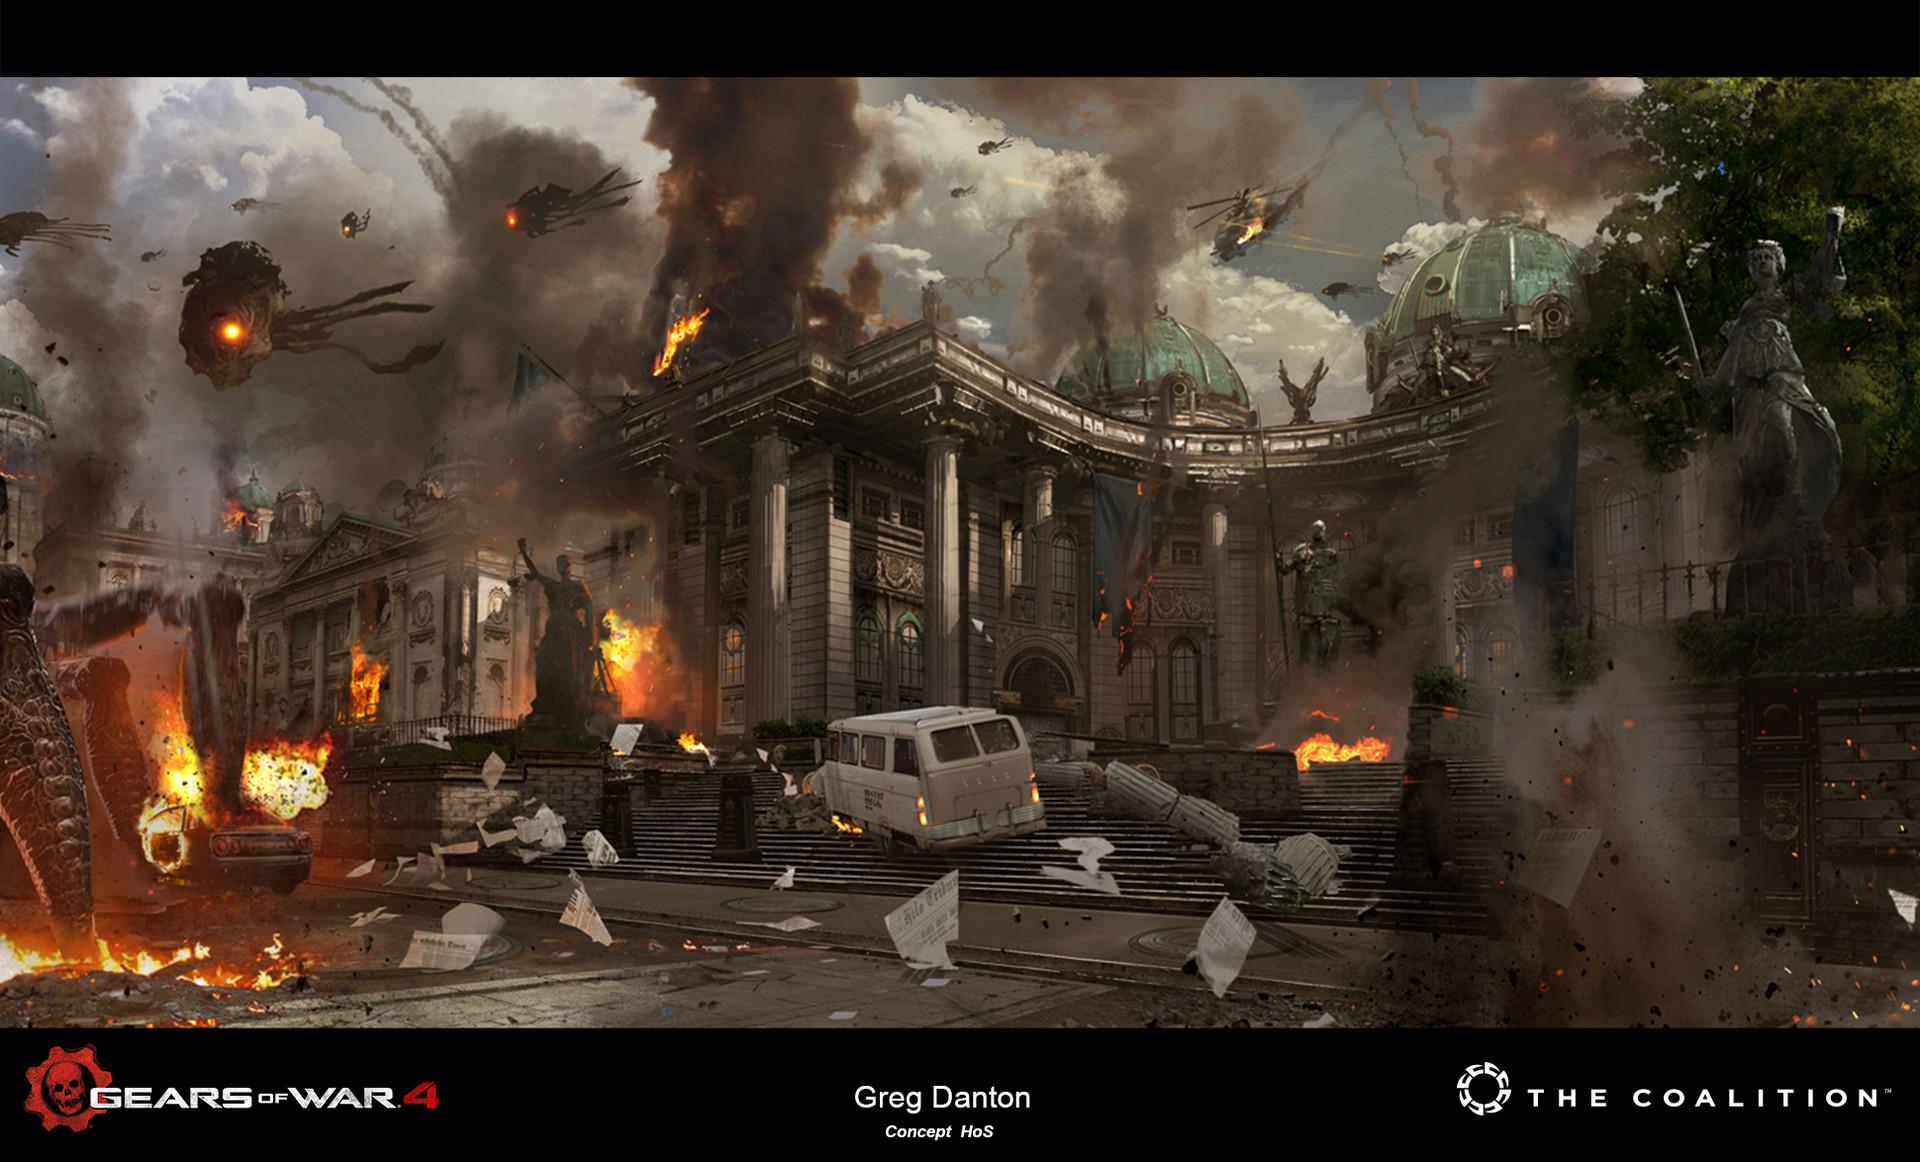 Greg danton art 18